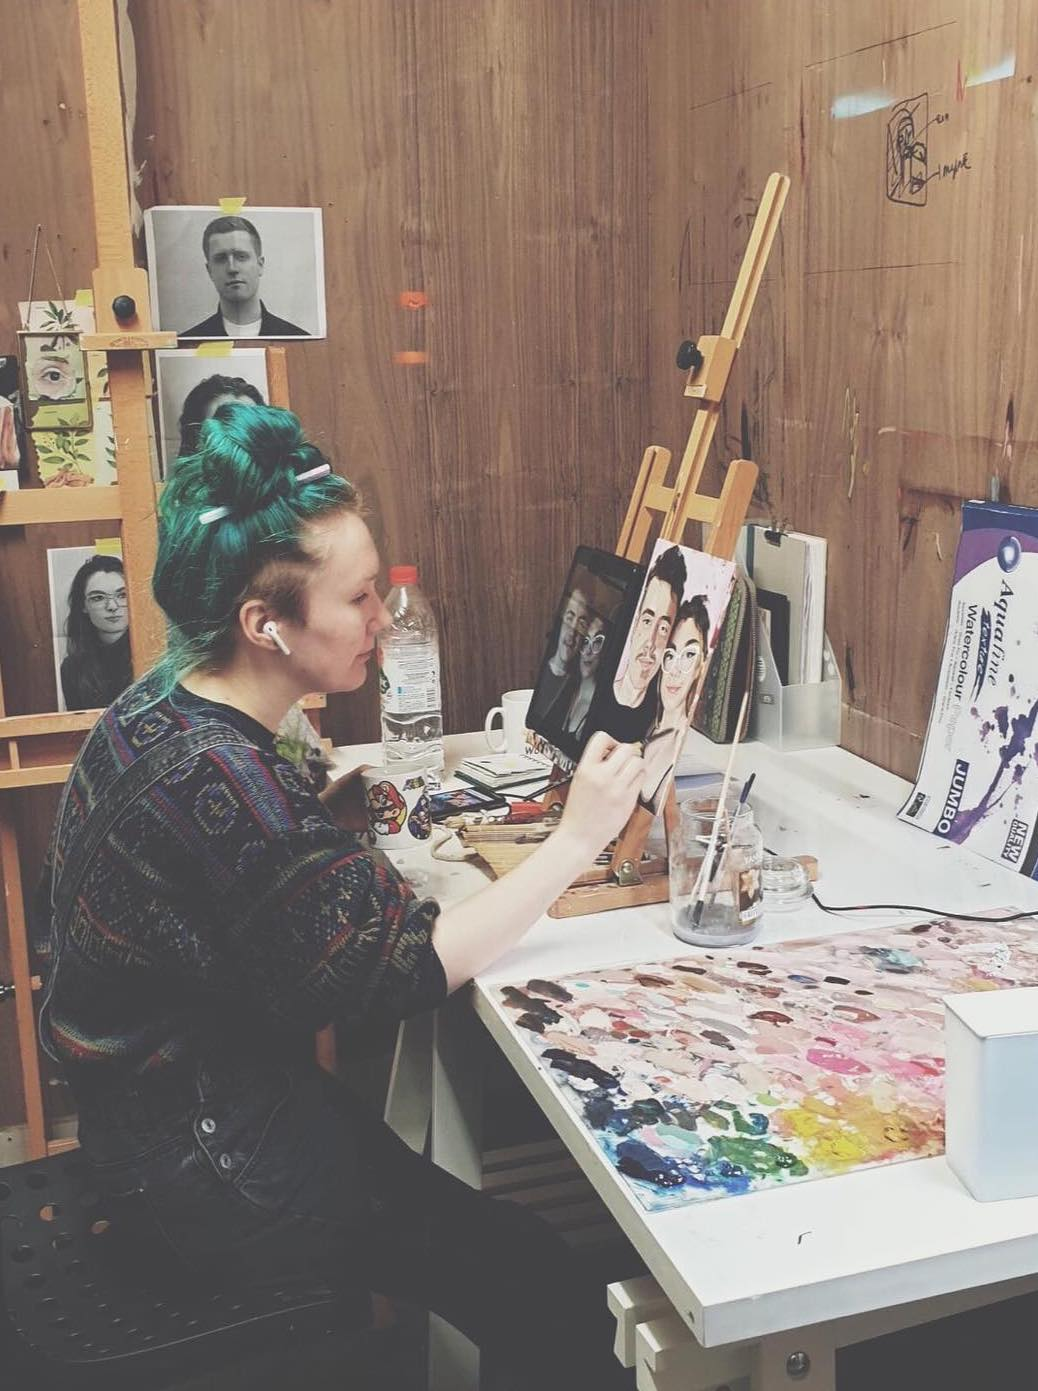 Annabelle Gralton | Be Momentful